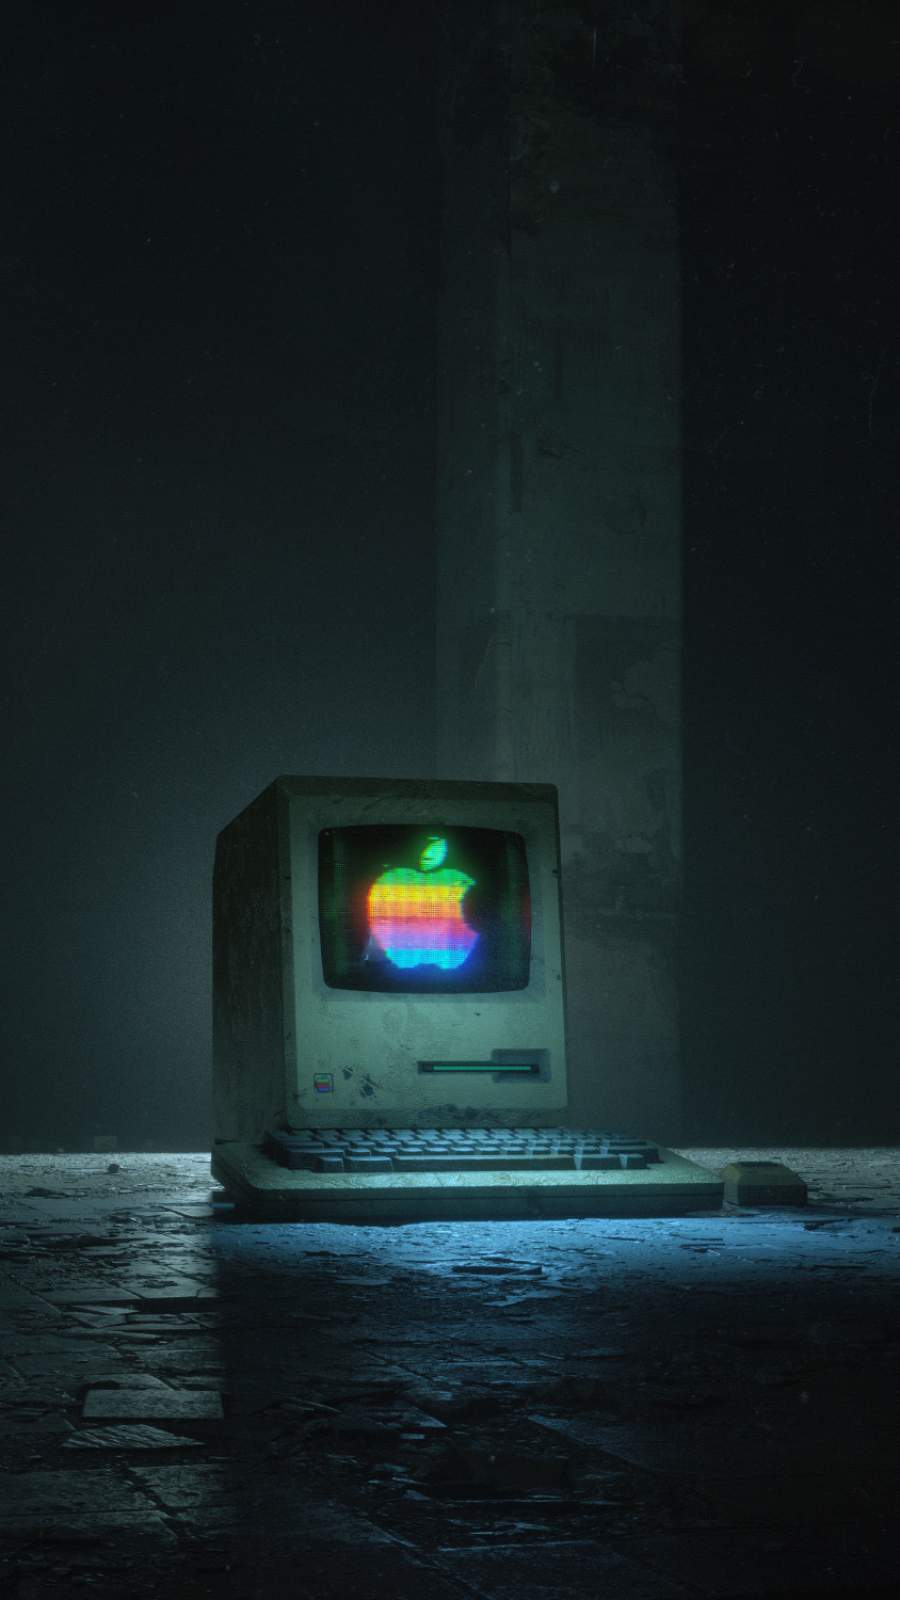 Apple First Generation iMac iPhone Wallpaper